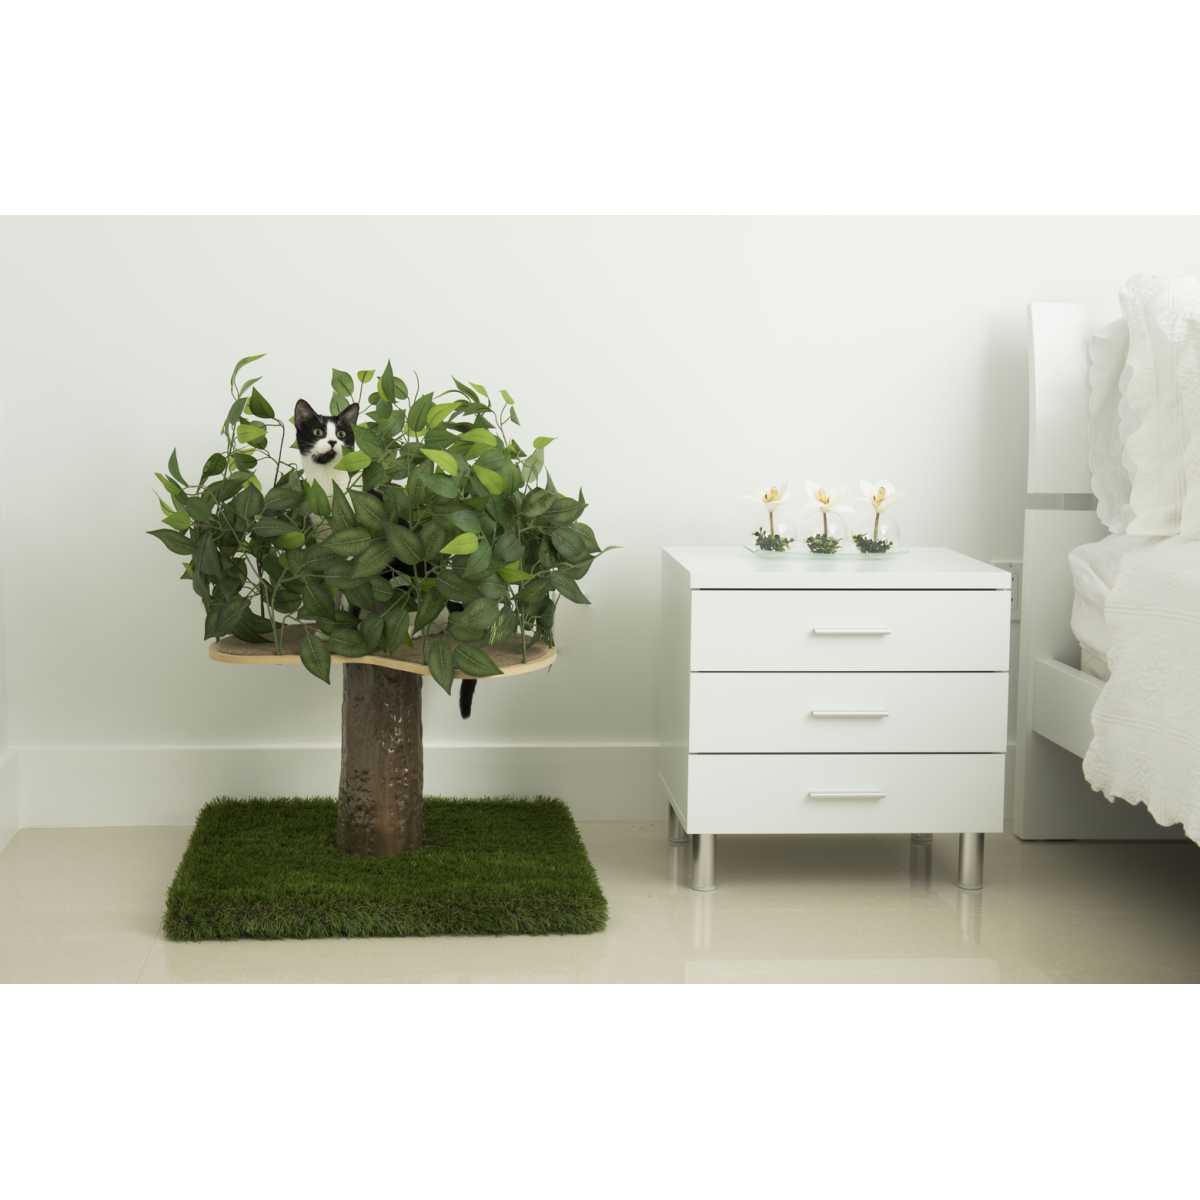 Luxury Cat Tree Small Square Base